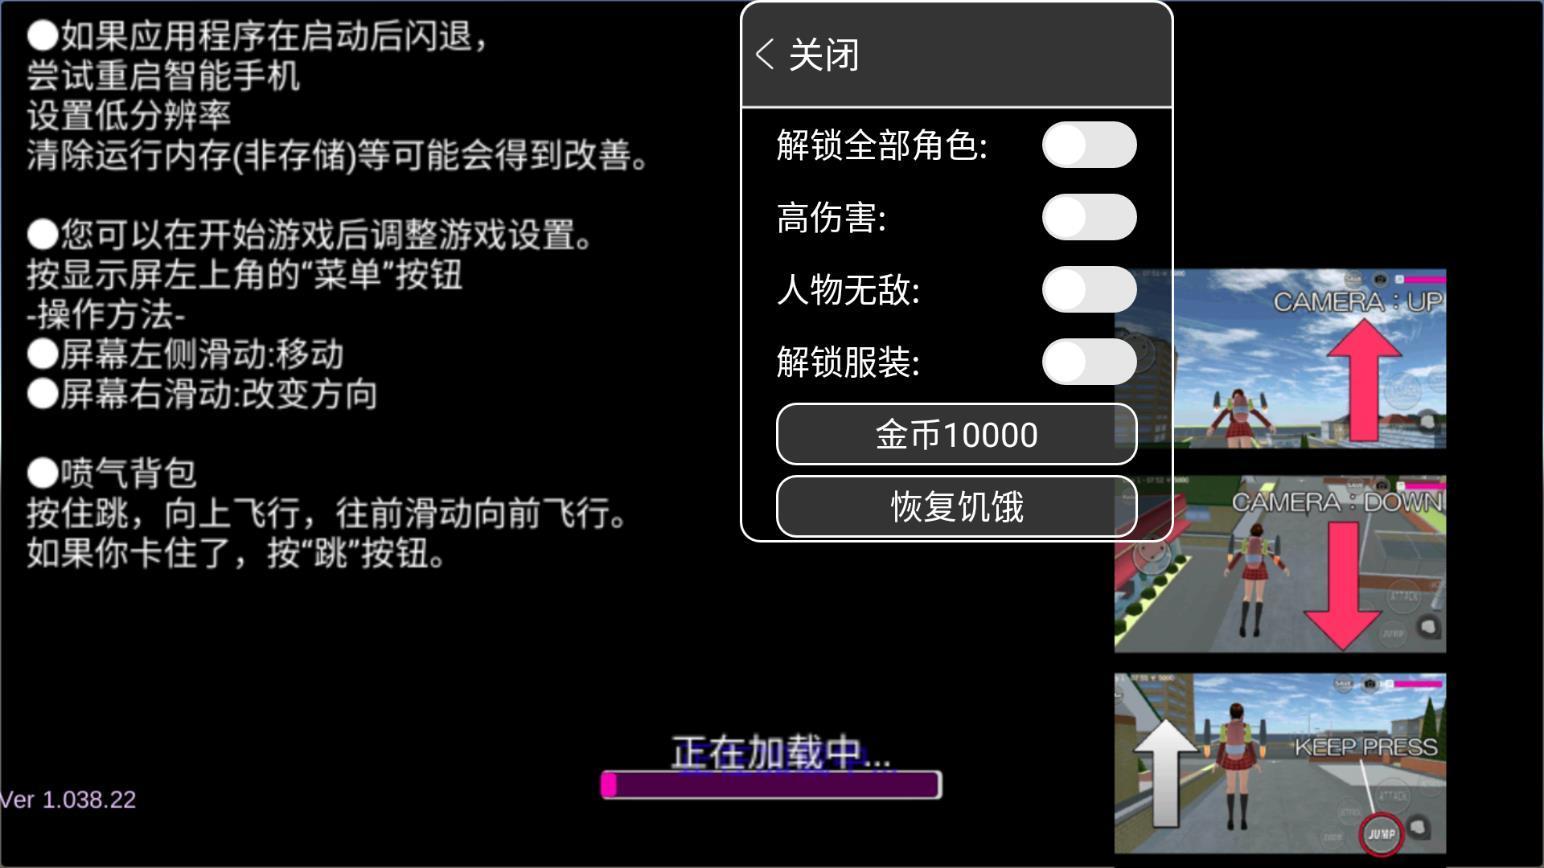 1bcb6bd0-b281-4a74-8f66-6cce955bb7f5.jpg